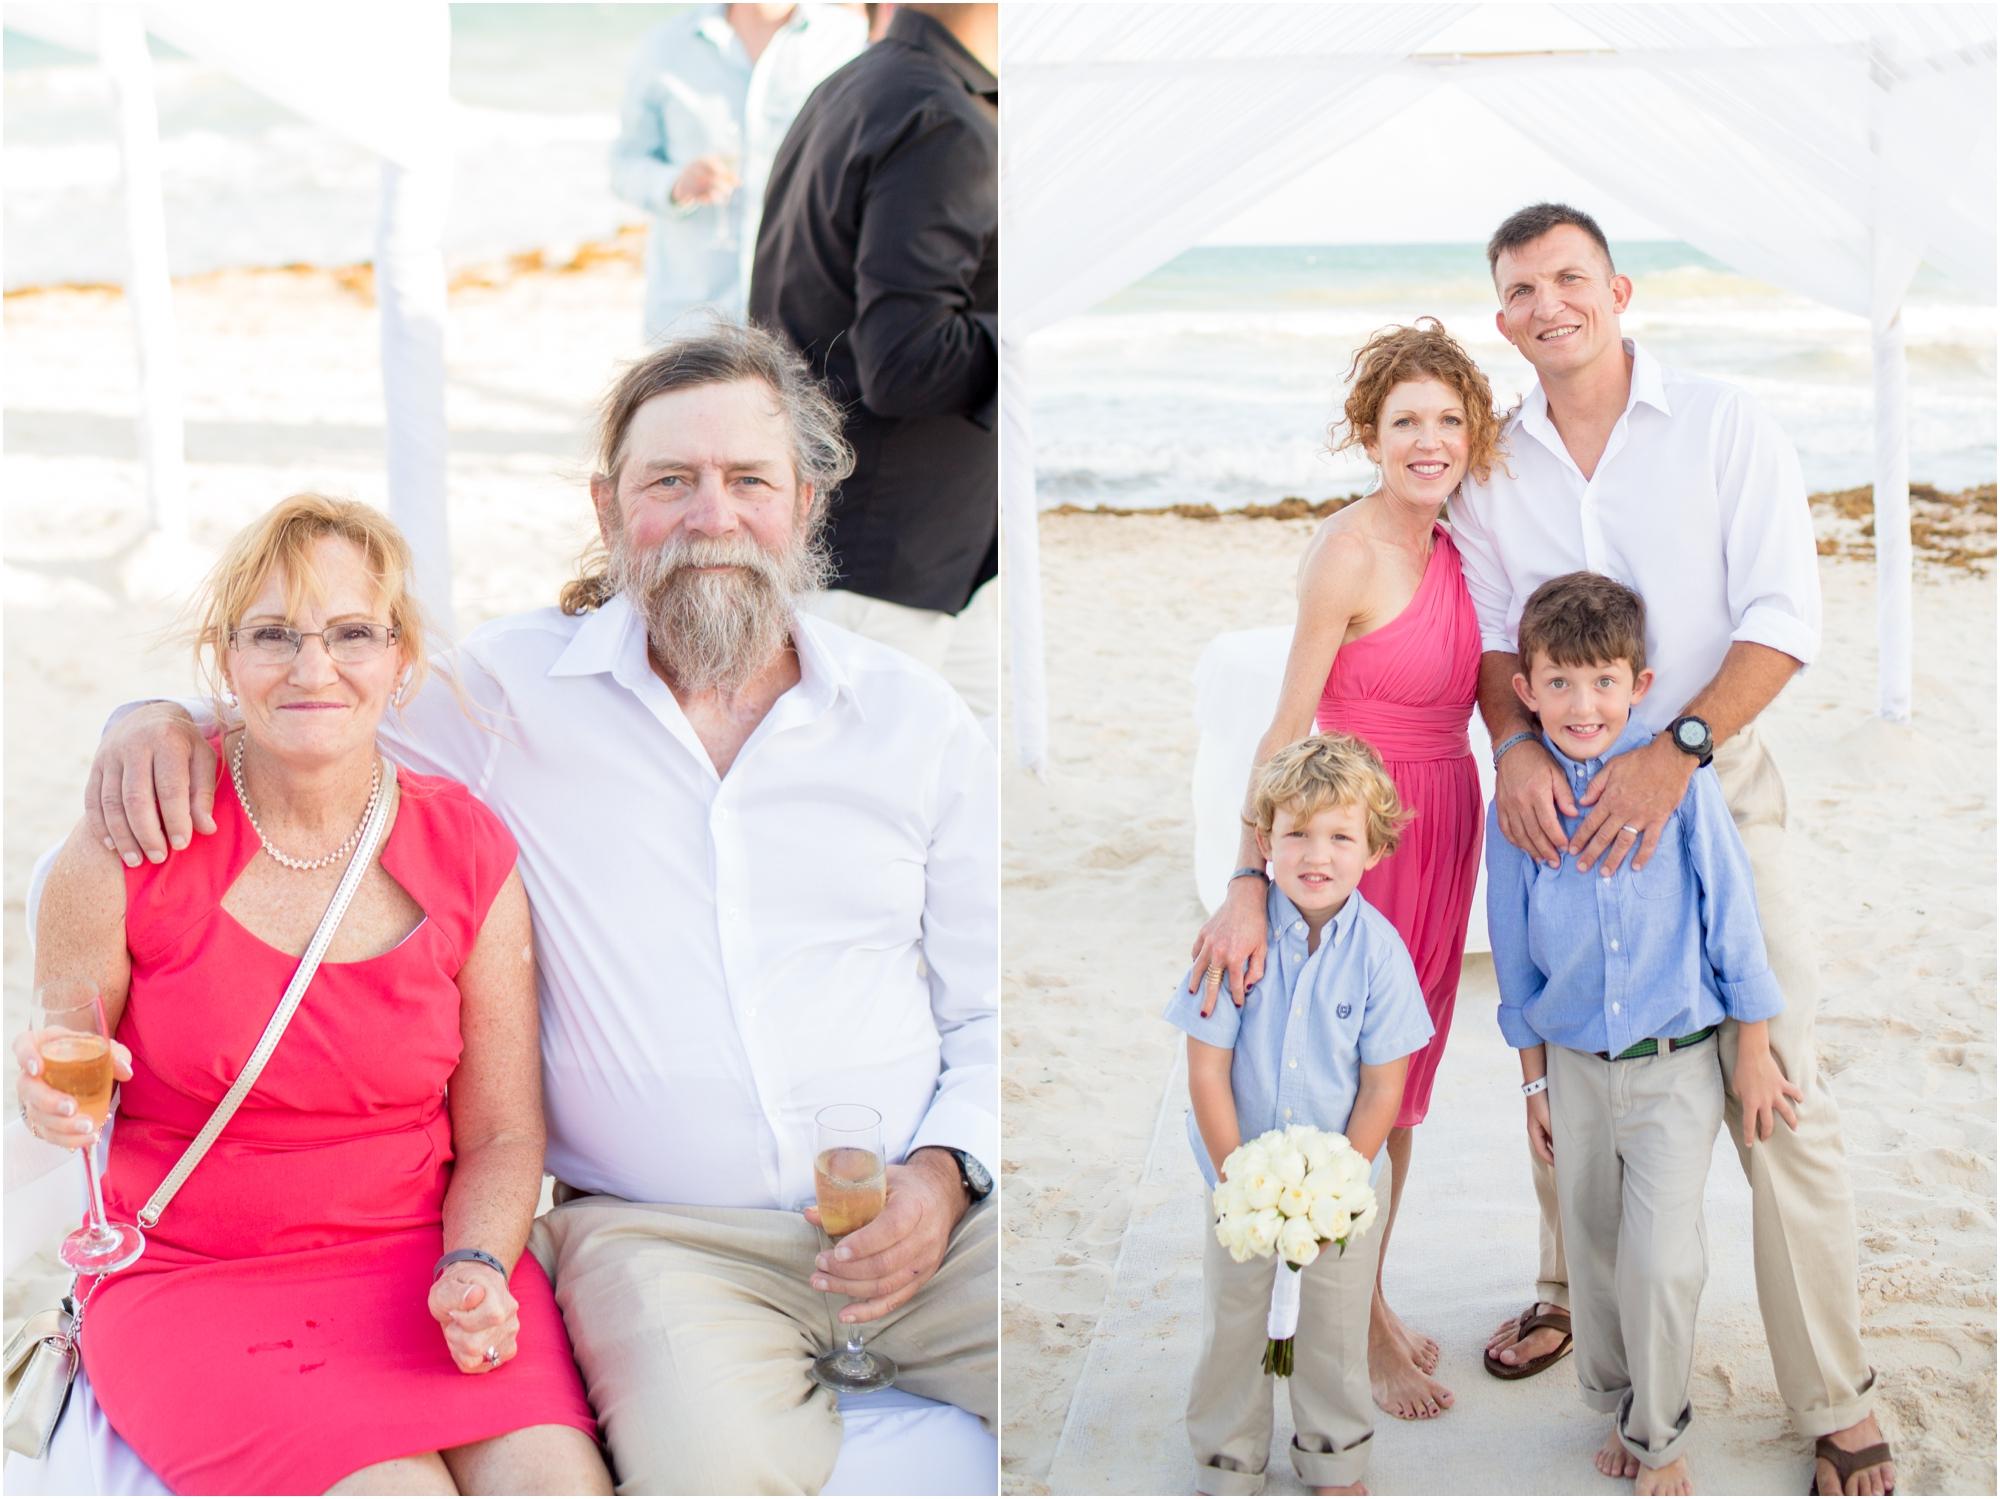 Morosoff Wedding 3-Family Formals-241_anna grace photography destination wedding photographer playa del carmen mexico photo.jpg